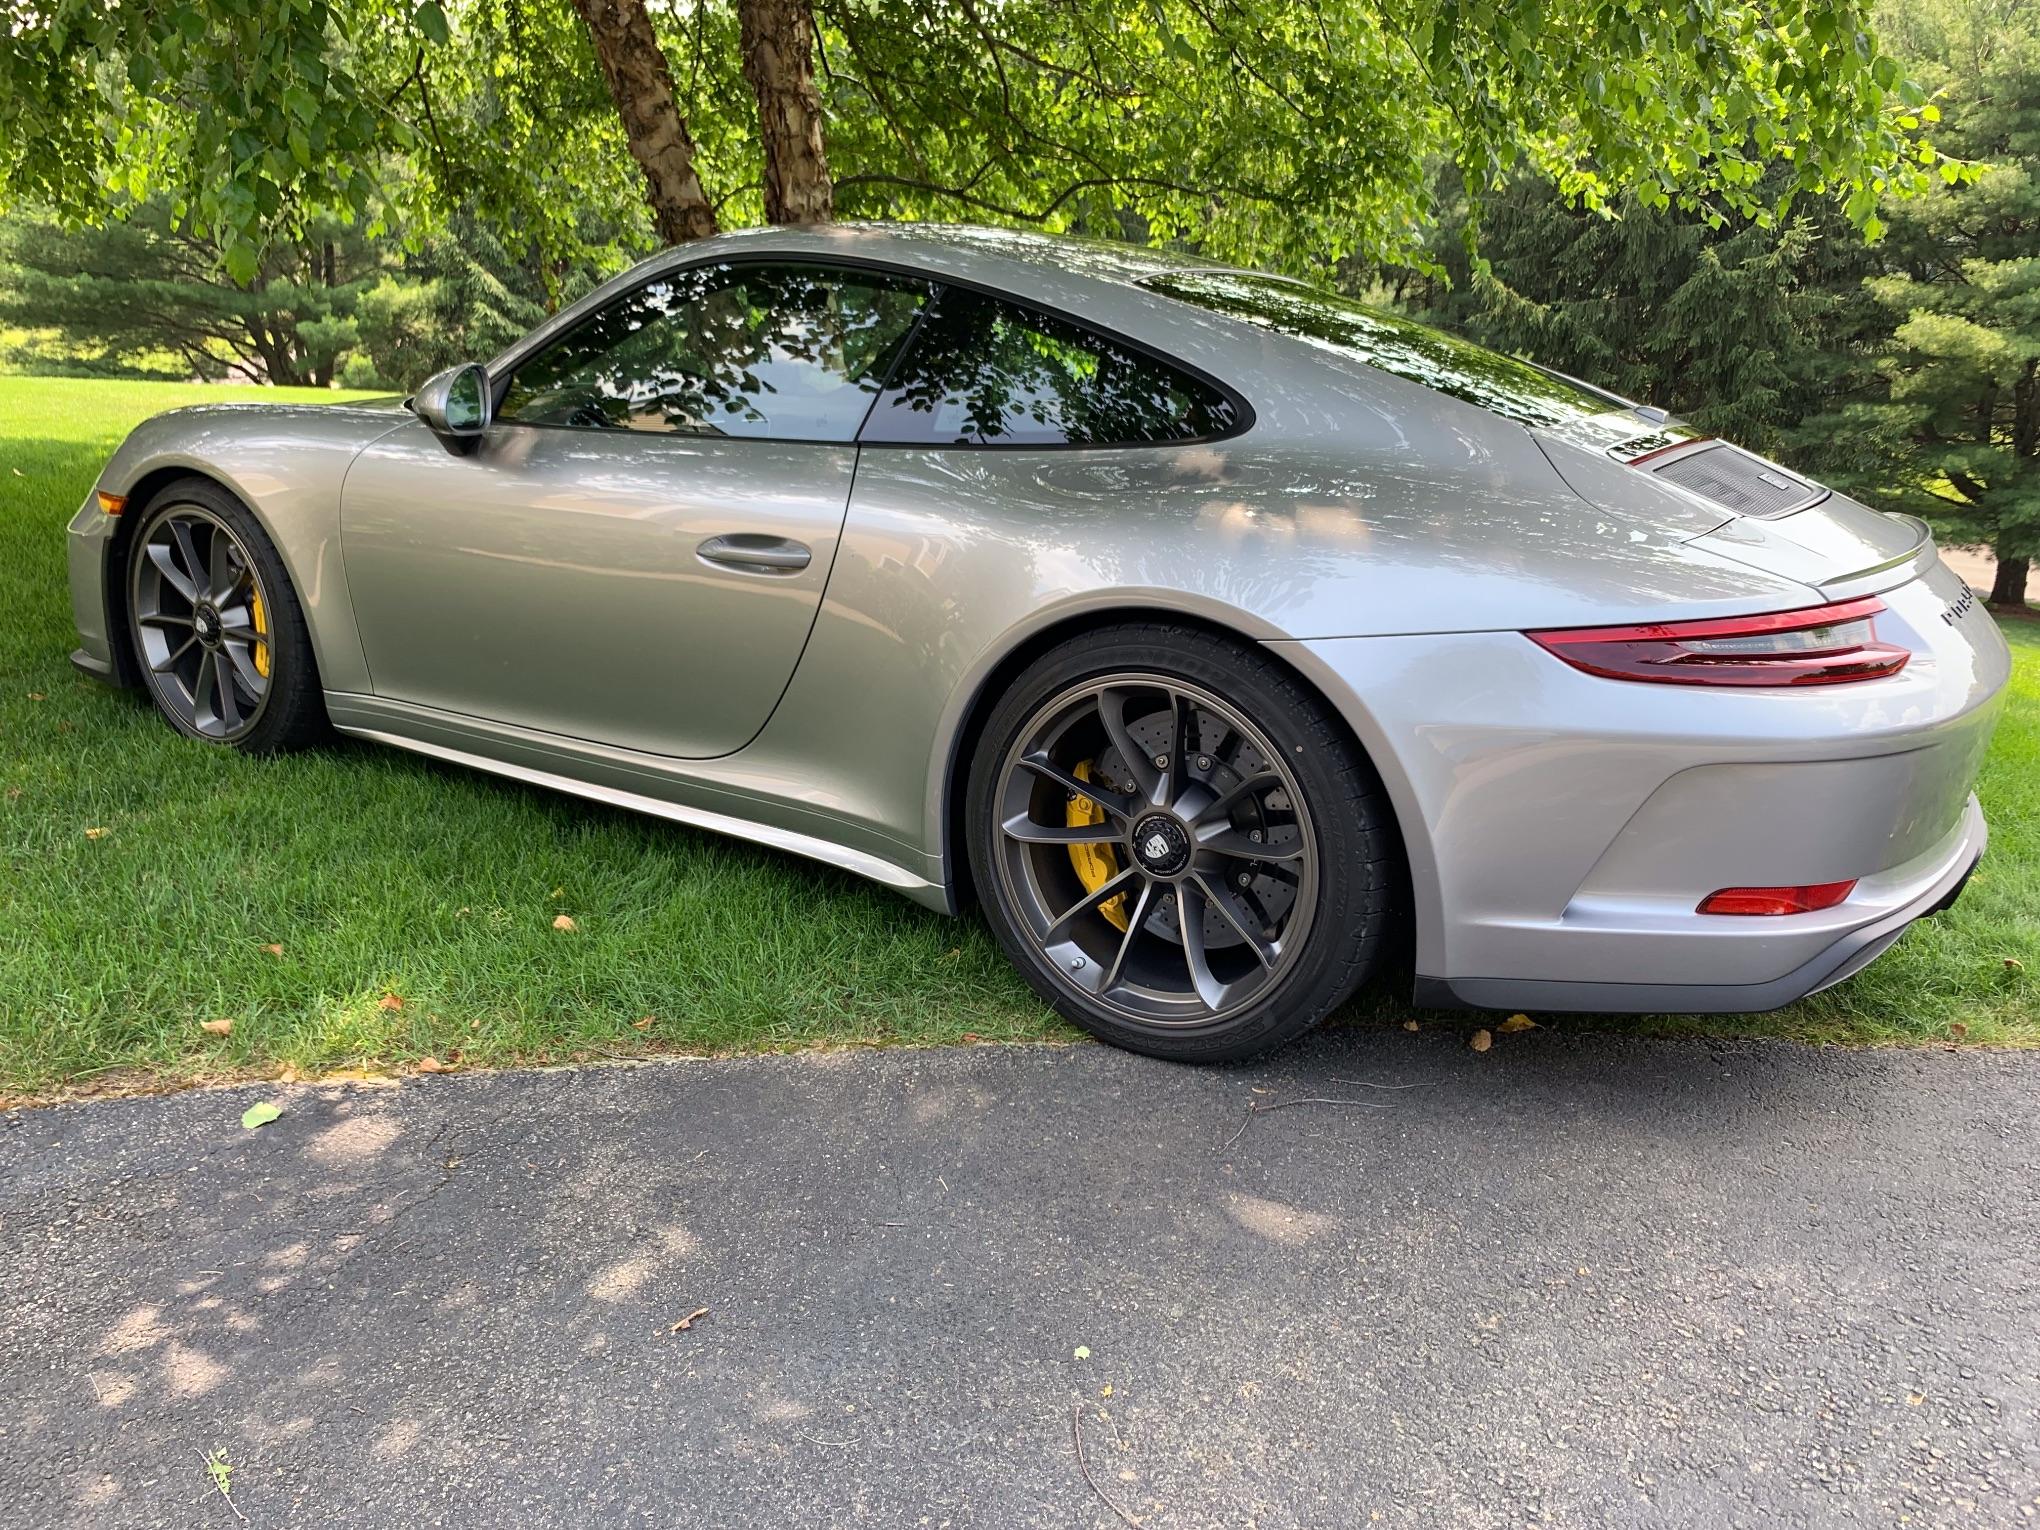 2019 Porsche 911 GT3 Touring | PCARMARKET